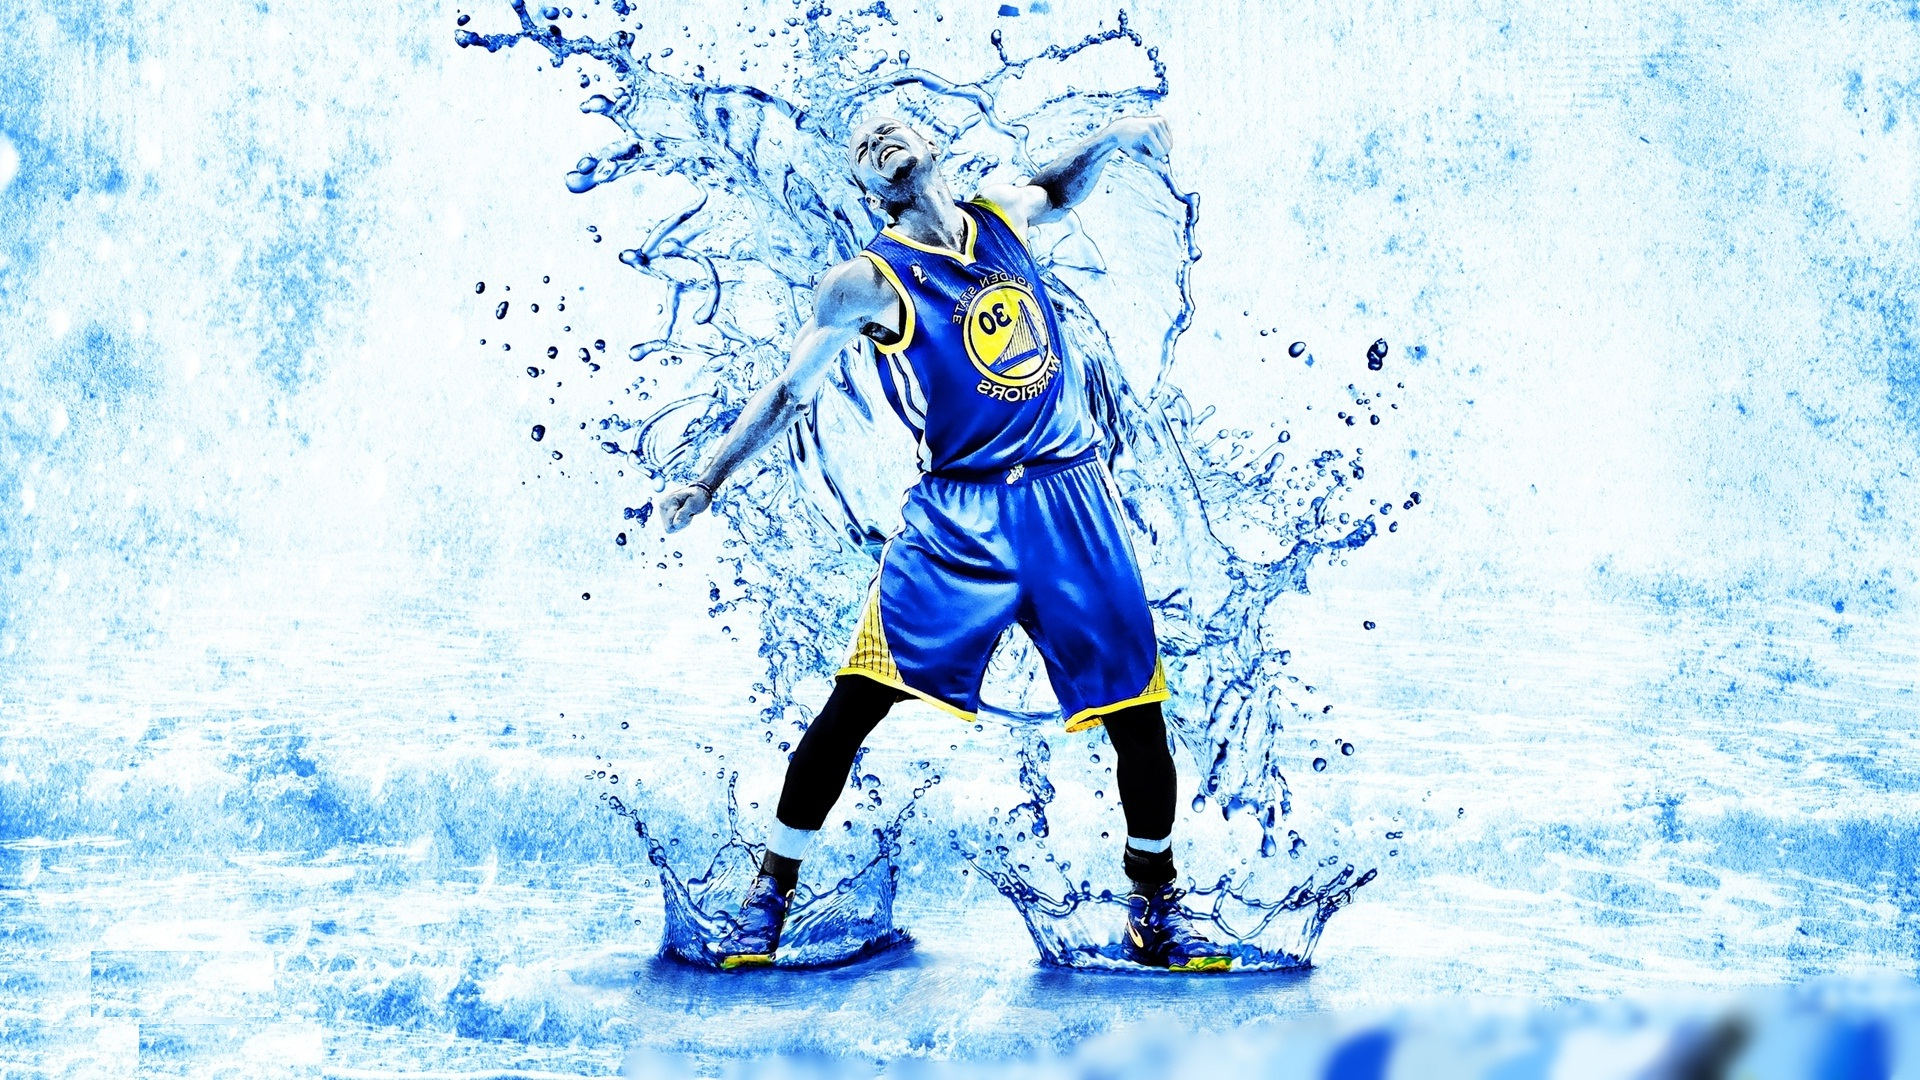 Stephen Curry Golden State Warriors 1920x1080